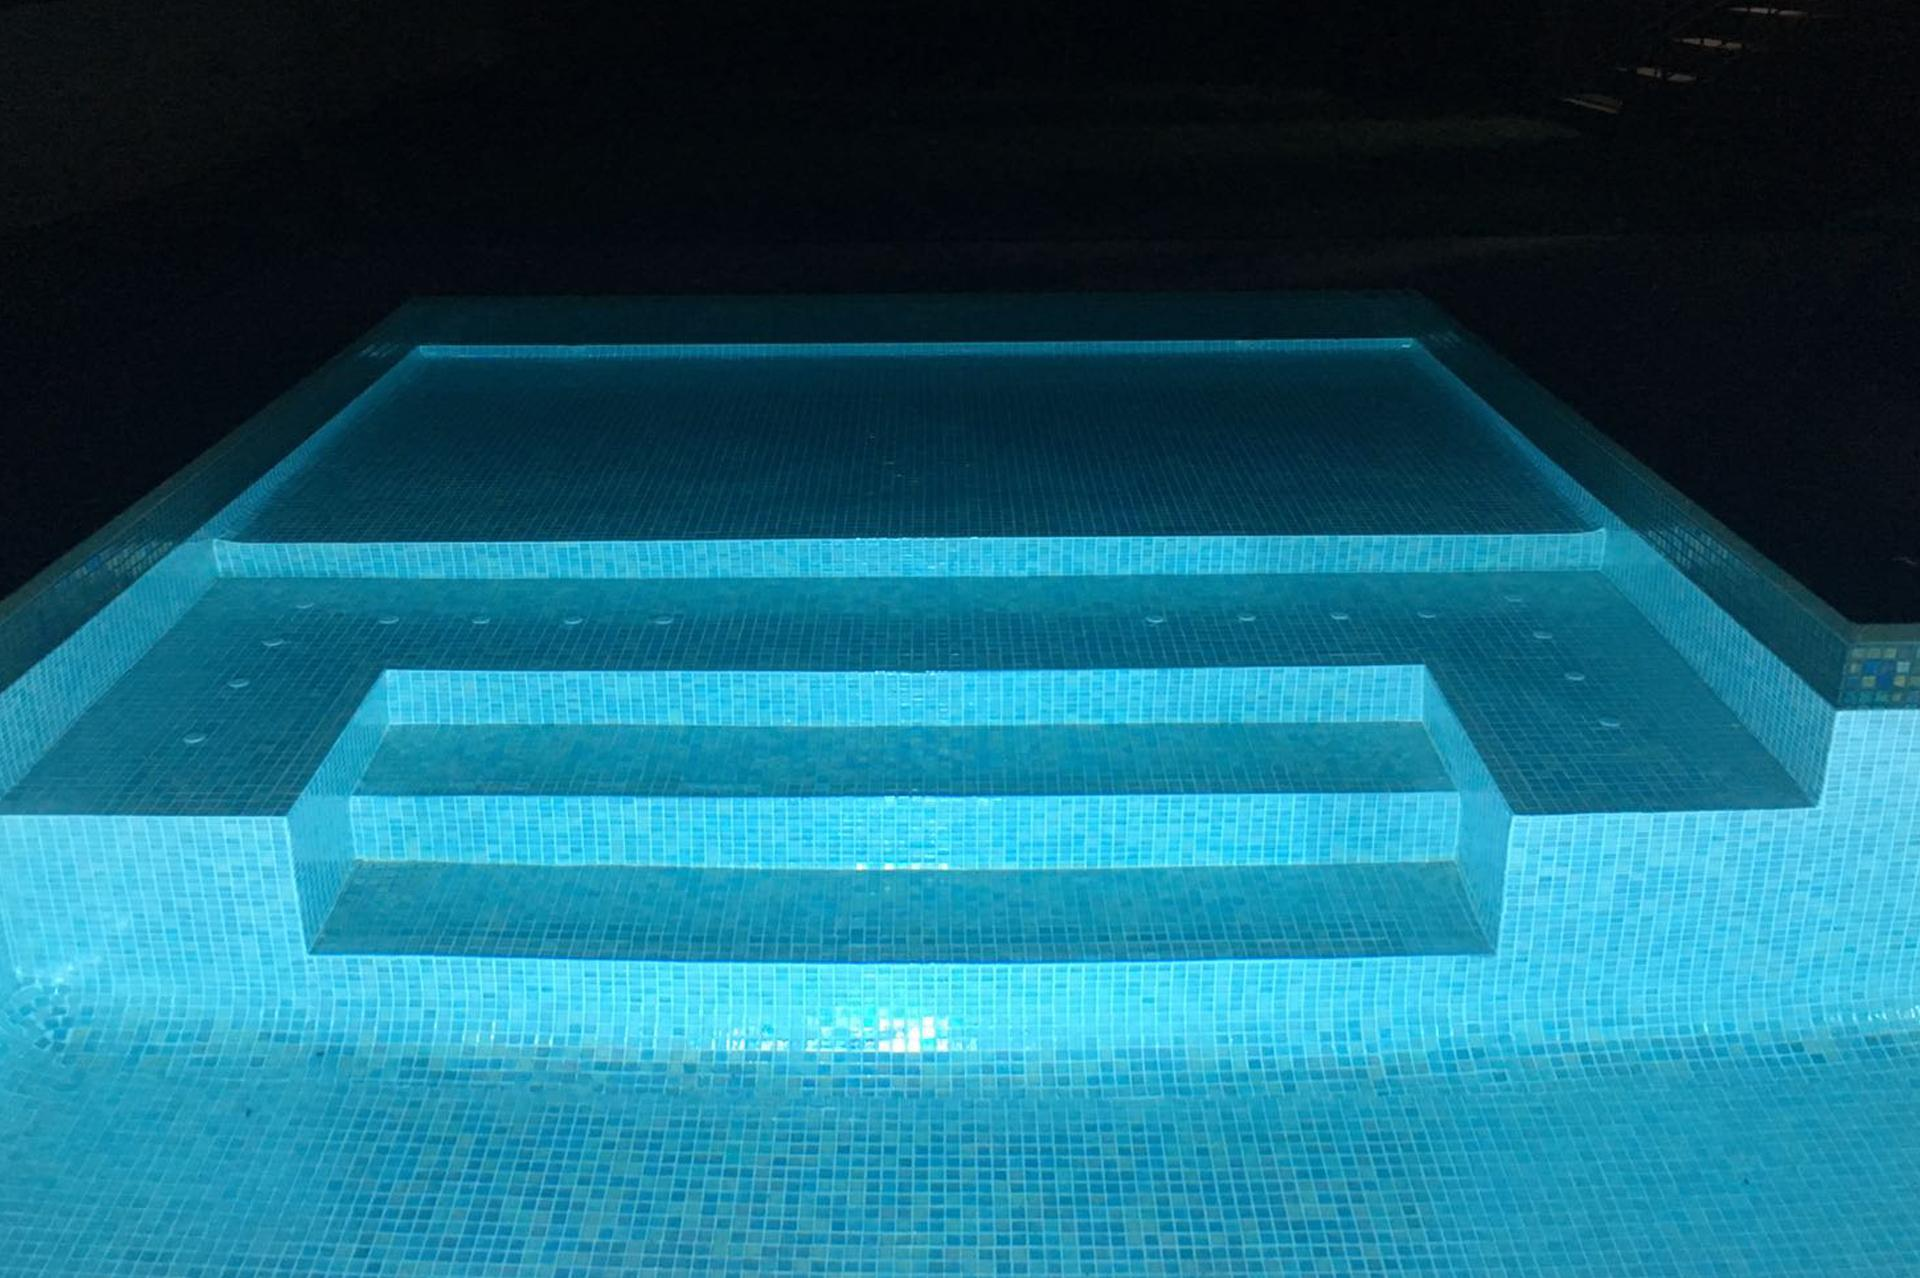 reforma_piscina_1_4